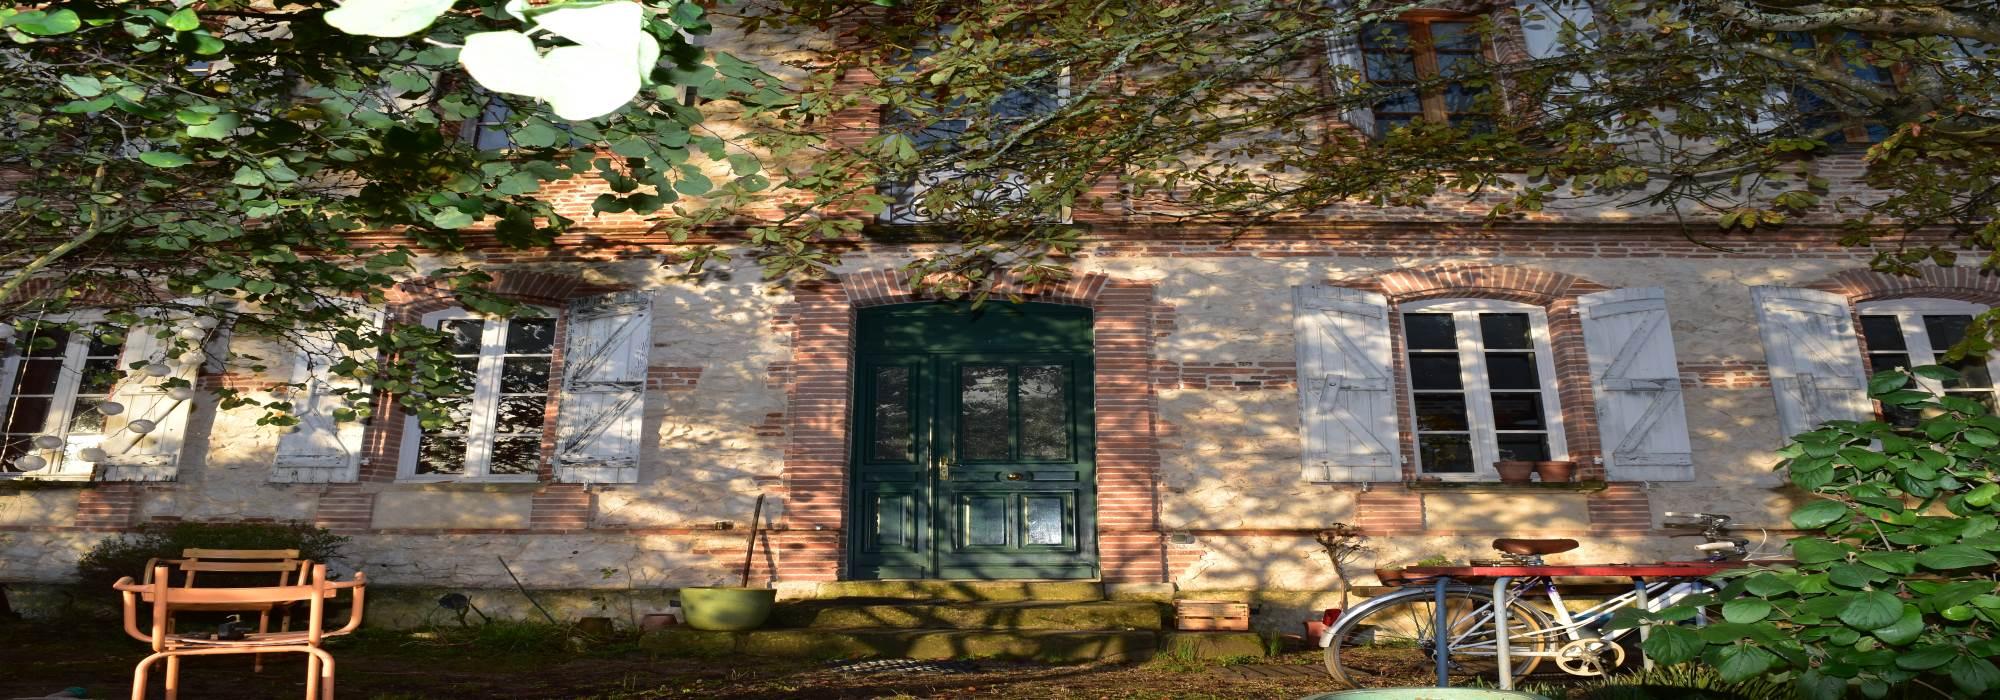 Maison bourgeoise 186 M² – 3 chambres – Jardin